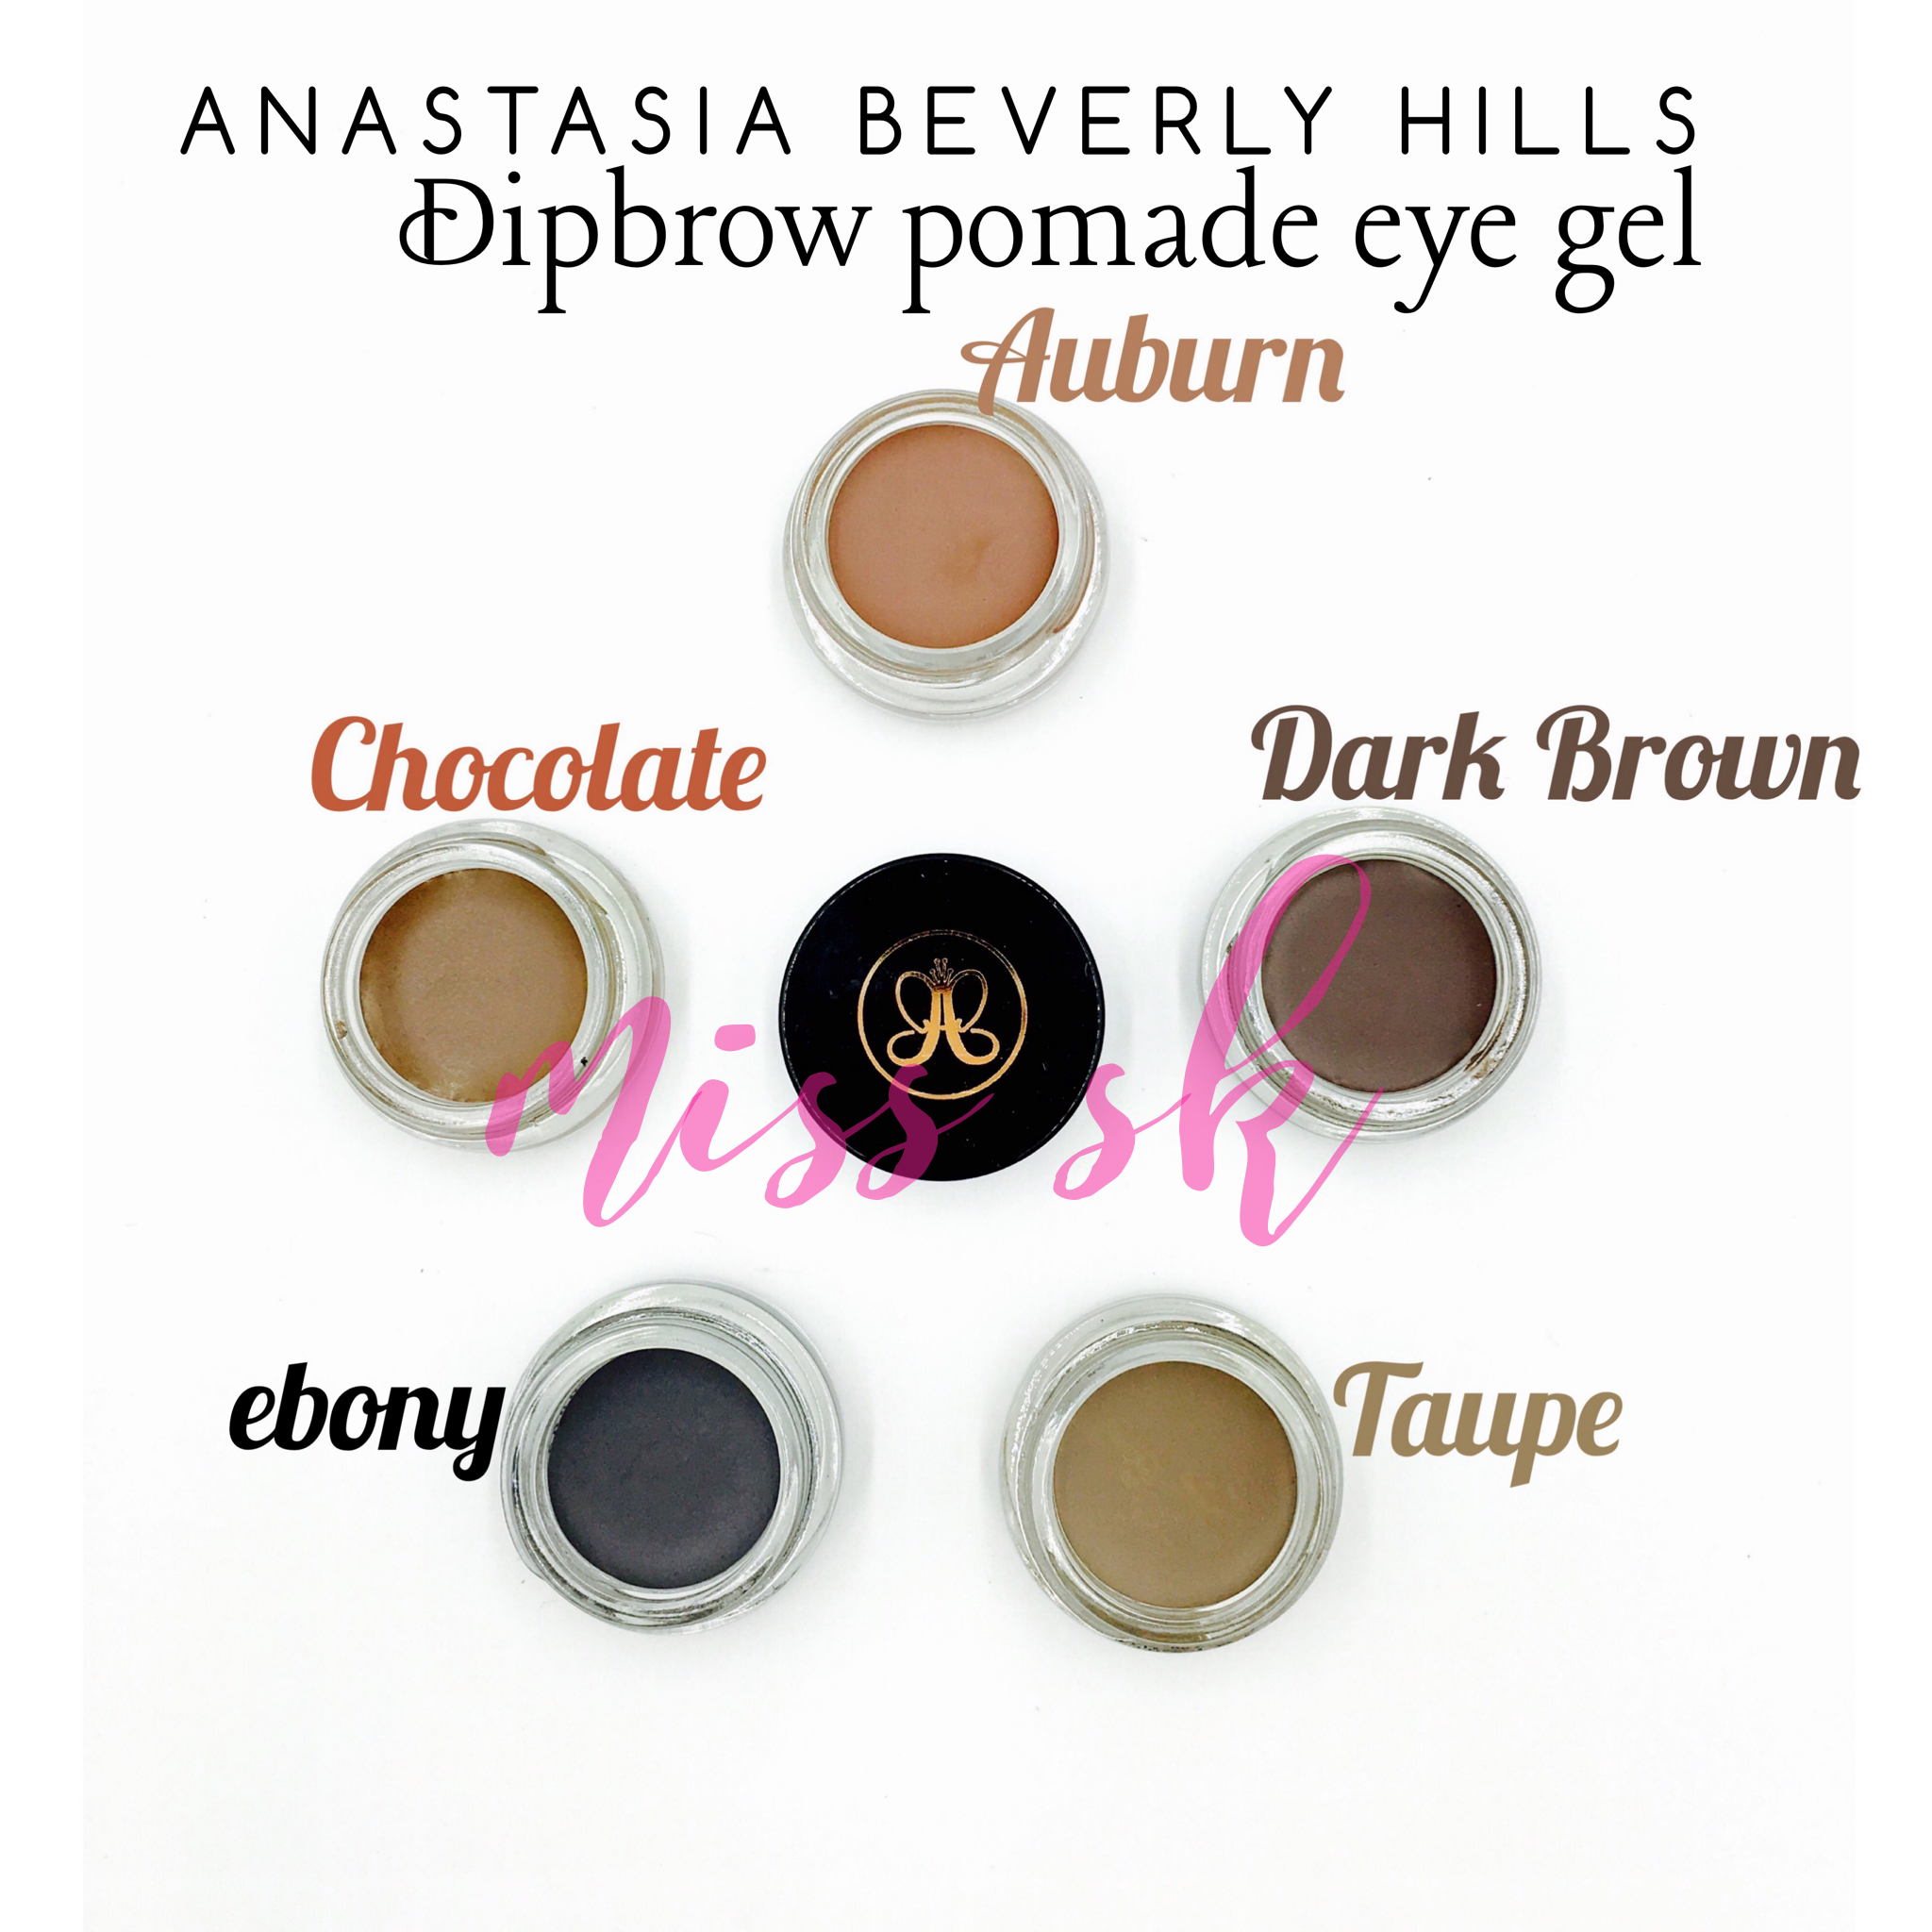 Anastasia beverly hills discount coupon